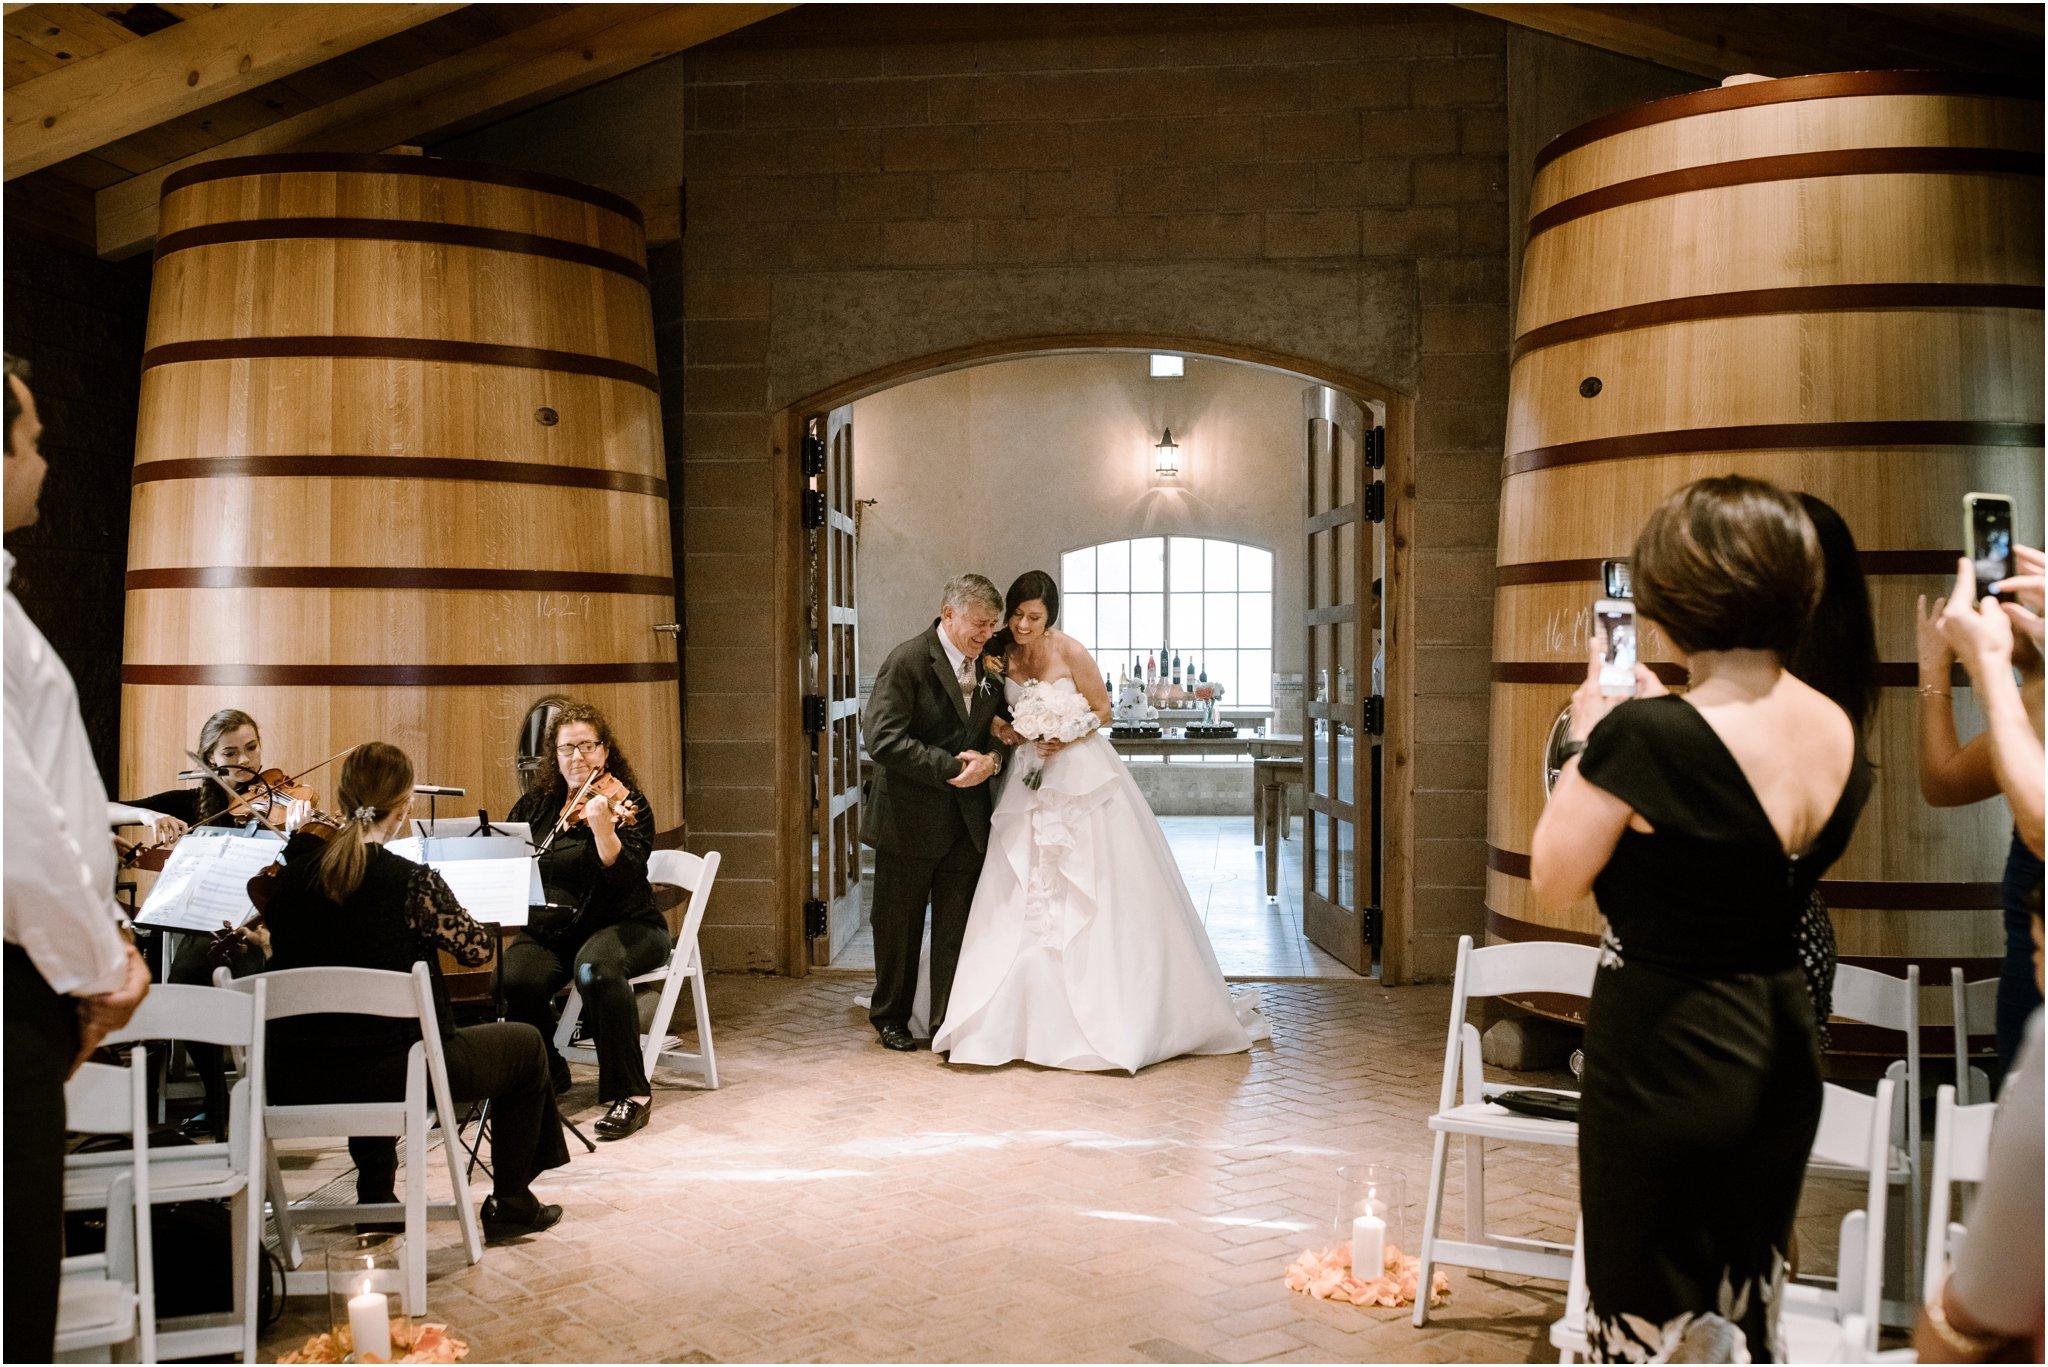 0202Casa Rodena Winery Wedding, Inn and Spa at Loretto wedding, Santa Fe wedding photographers, blue rose photography